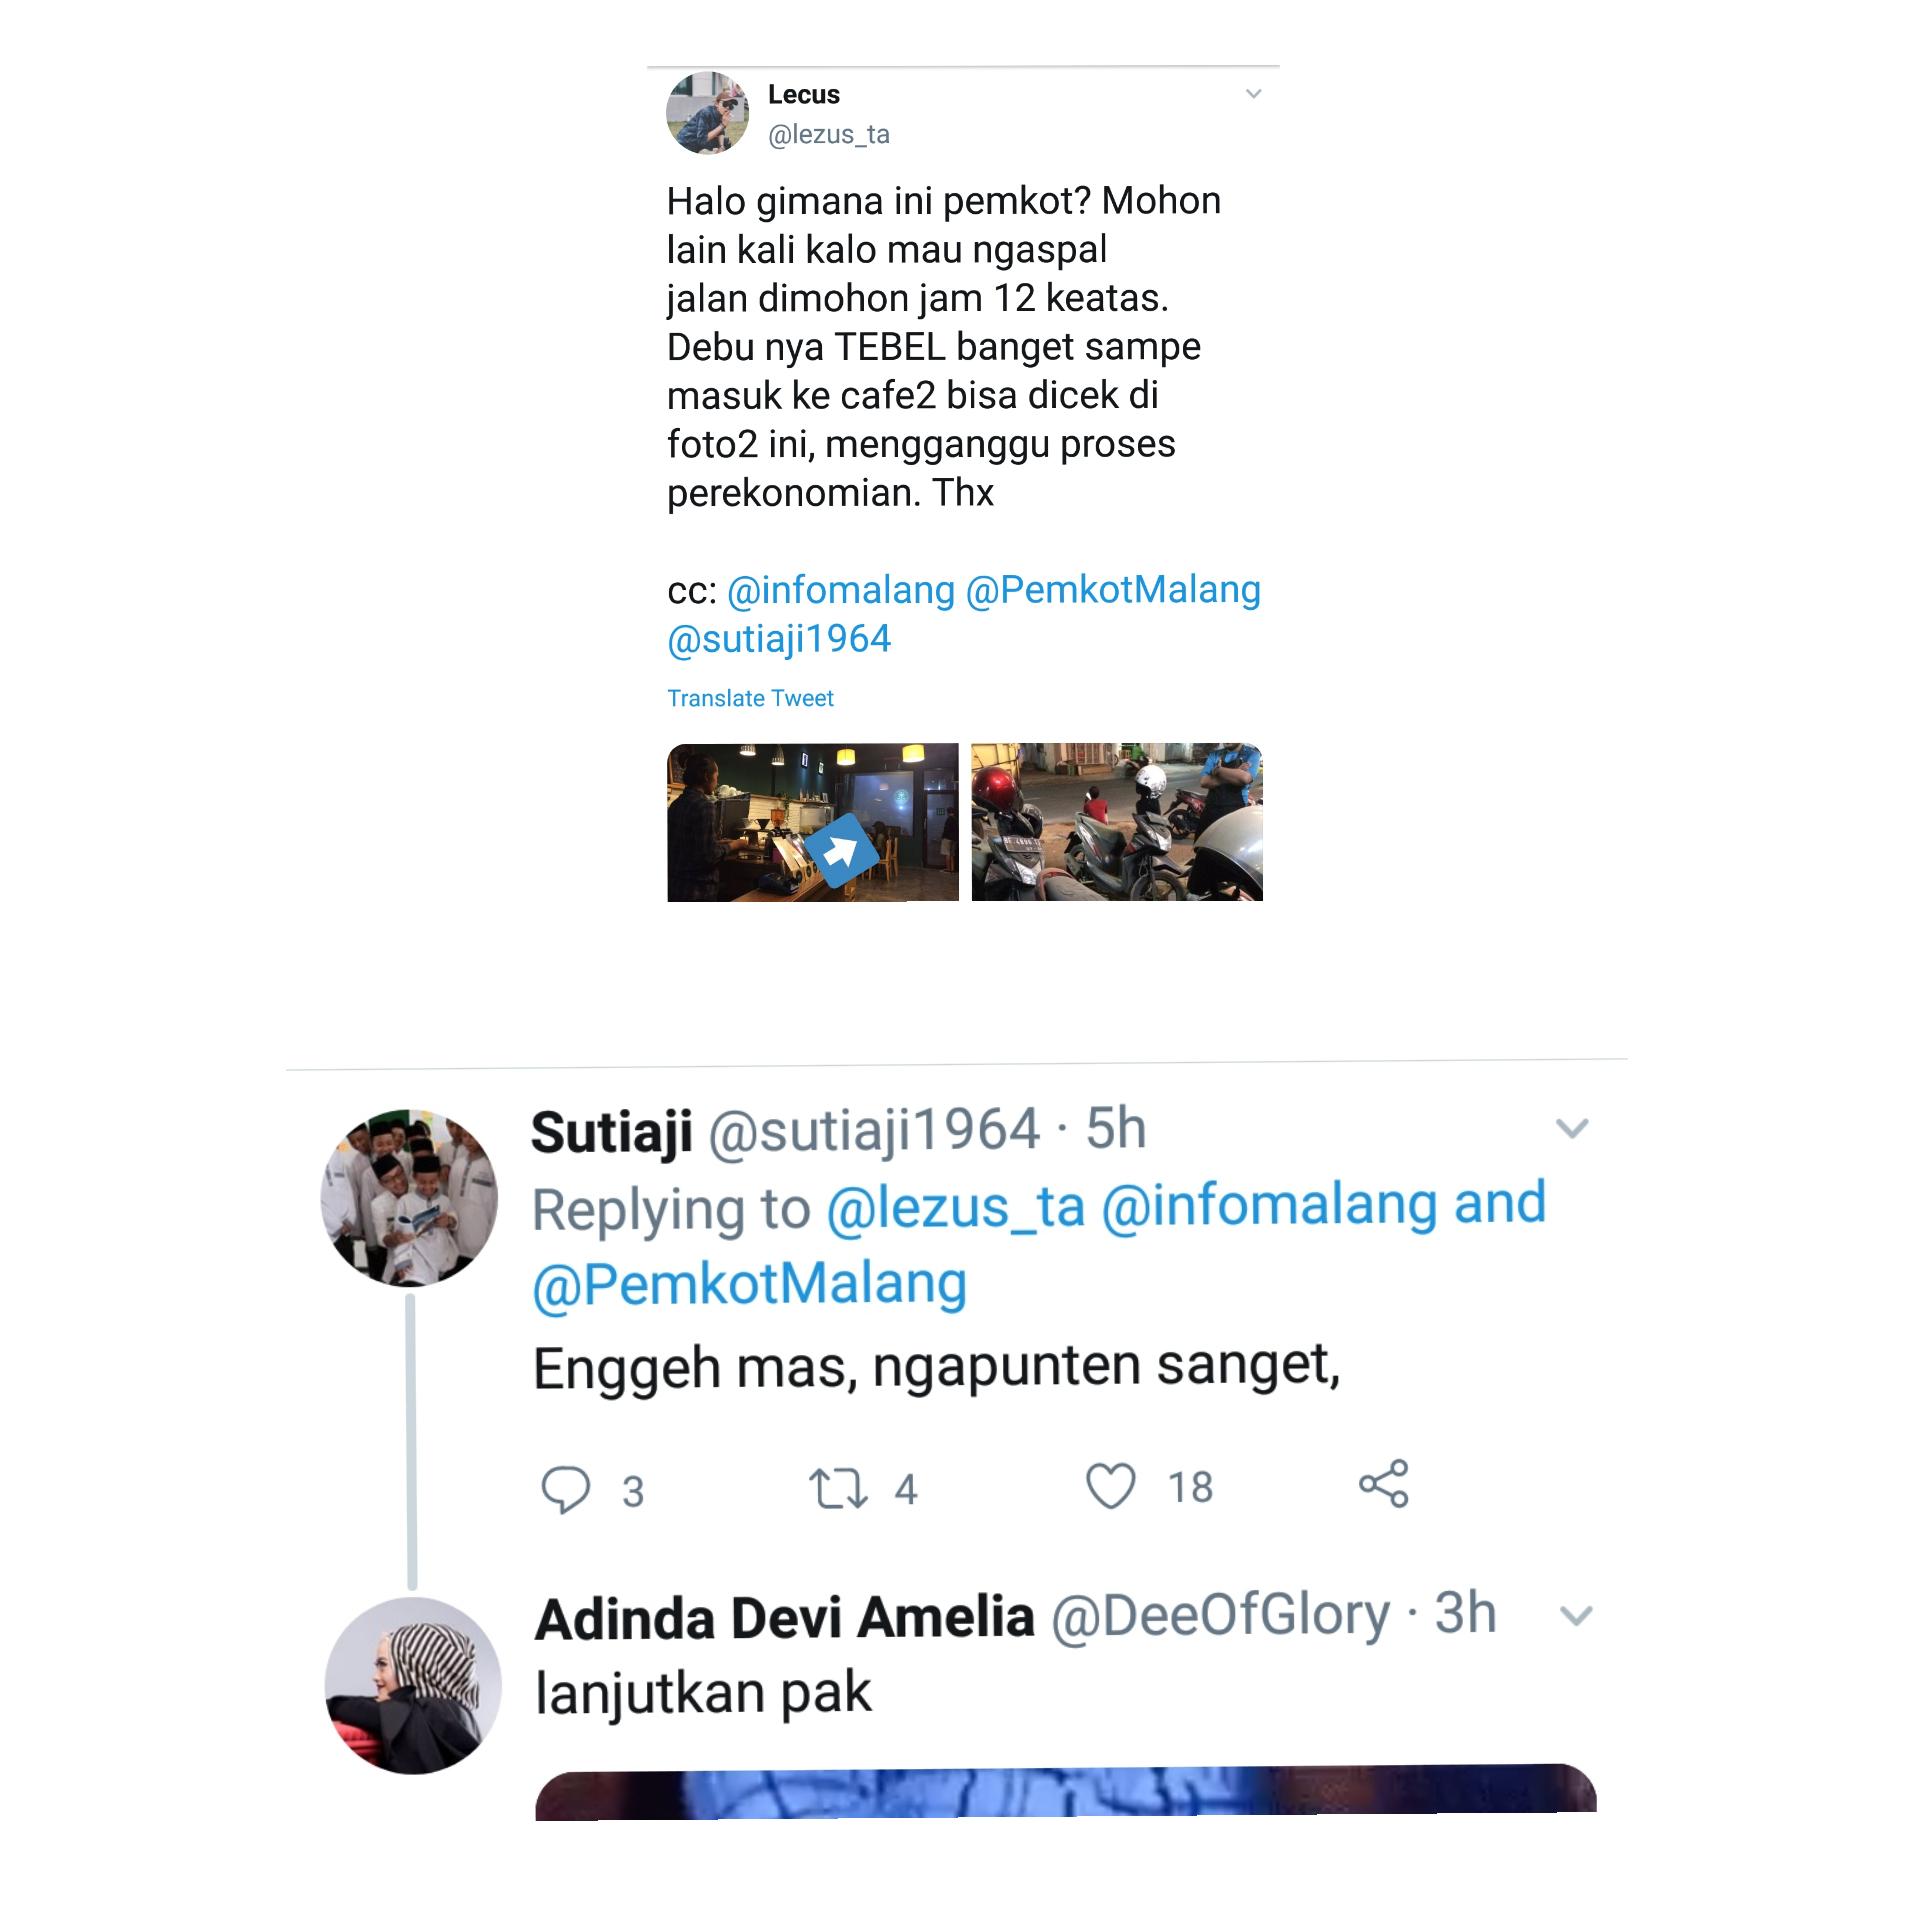 Ungkapan protes warganet kepada Wali Kota Malang Sutiaji. (Source : Twitter)